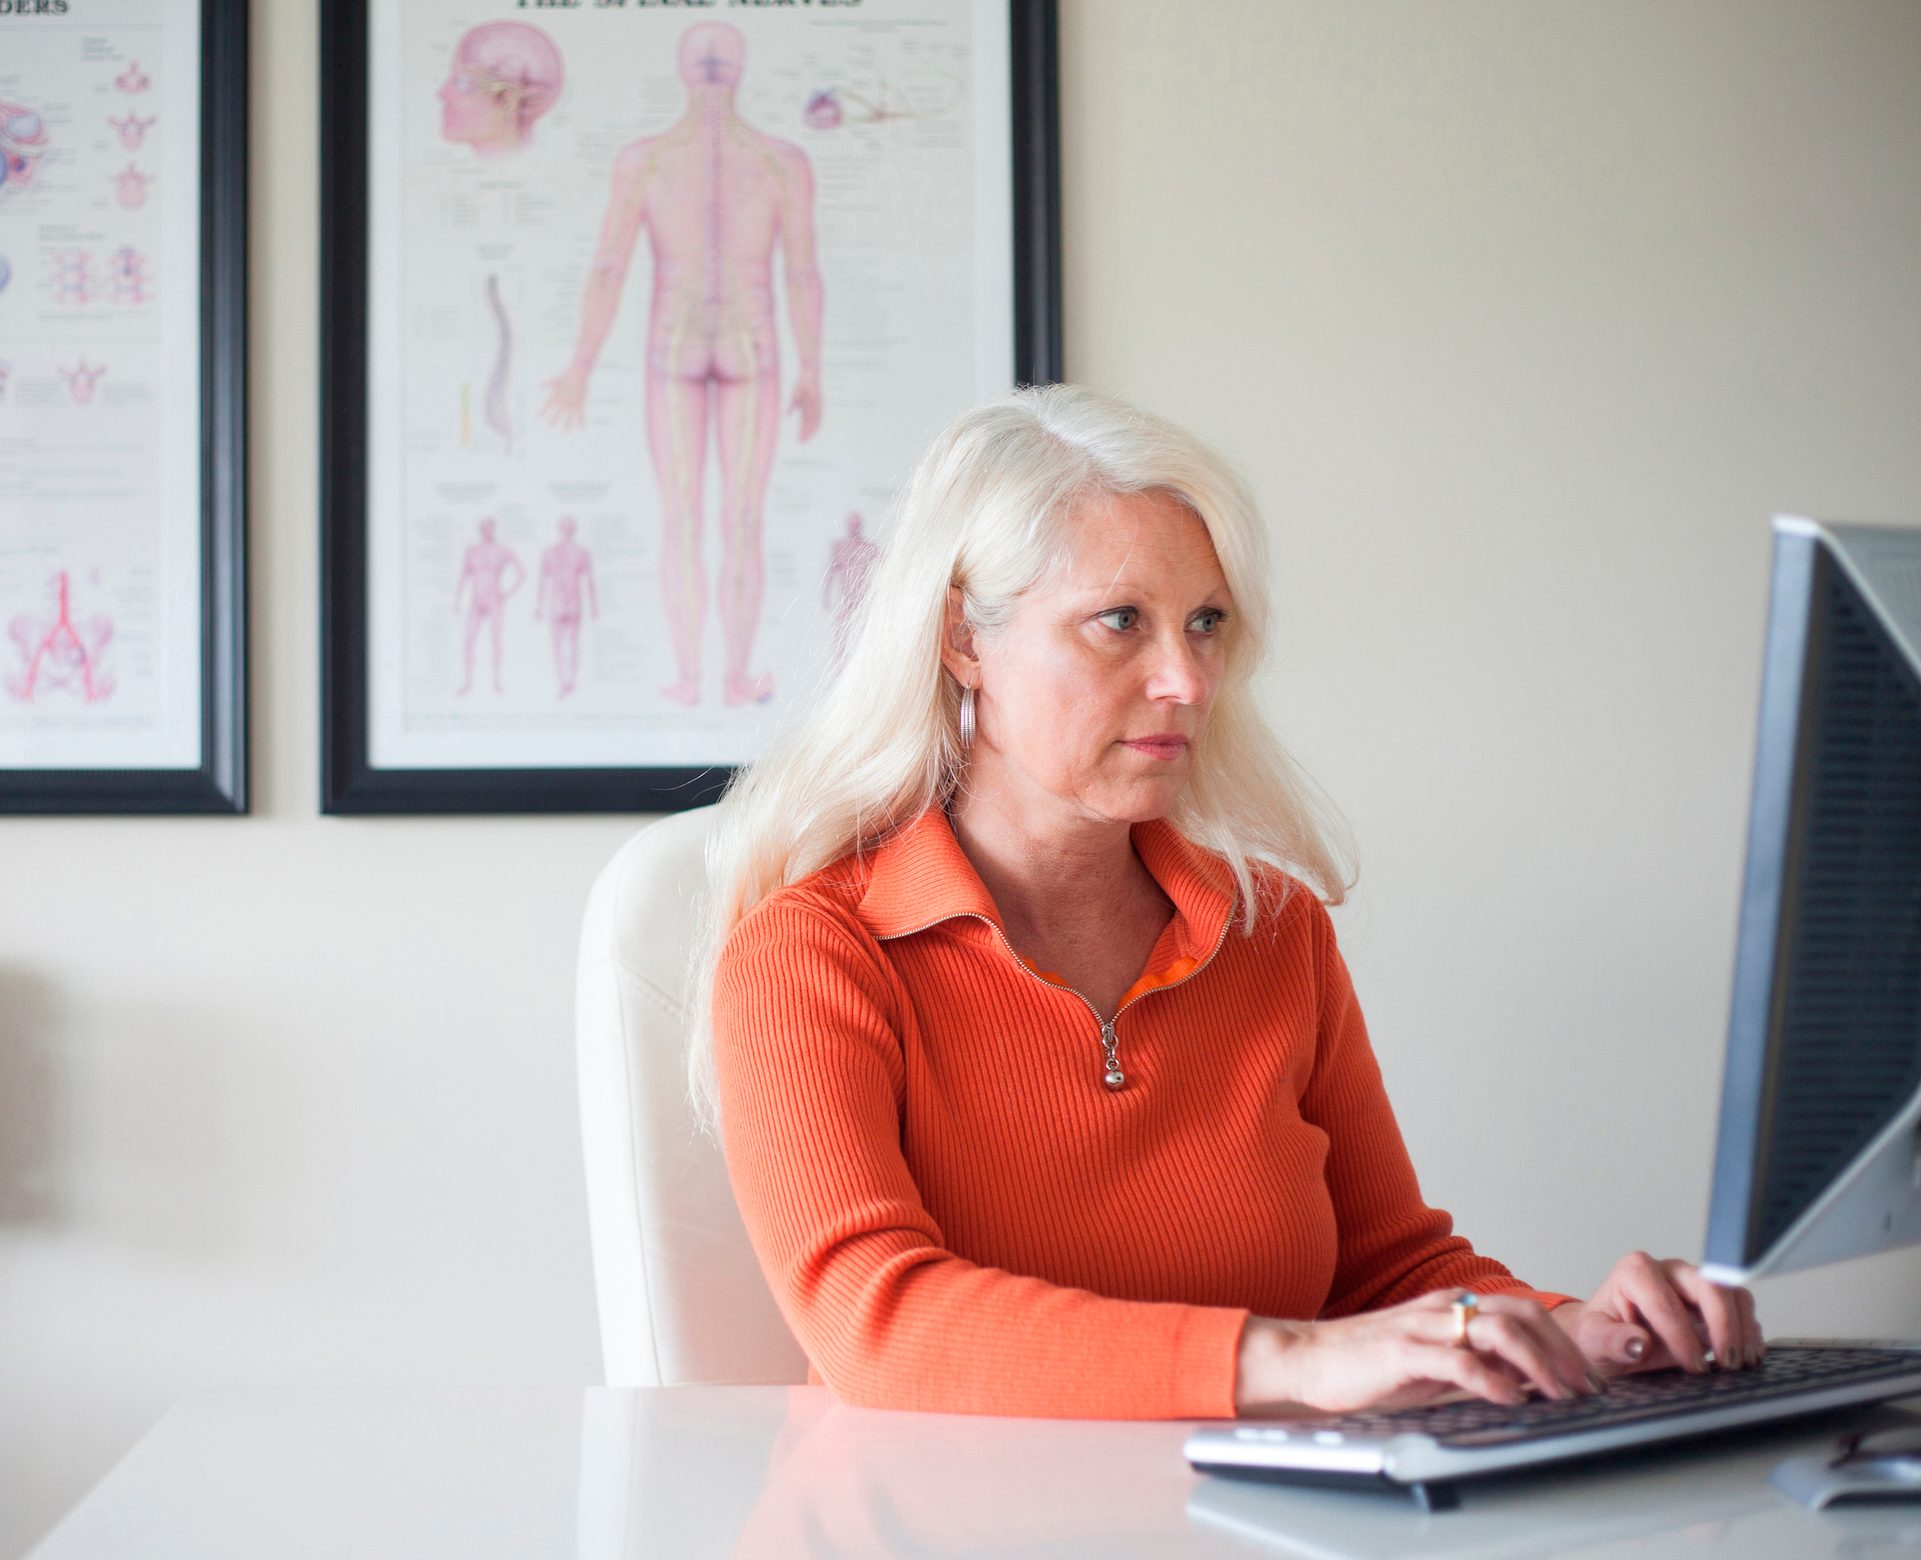 chiropractor working at desk computer